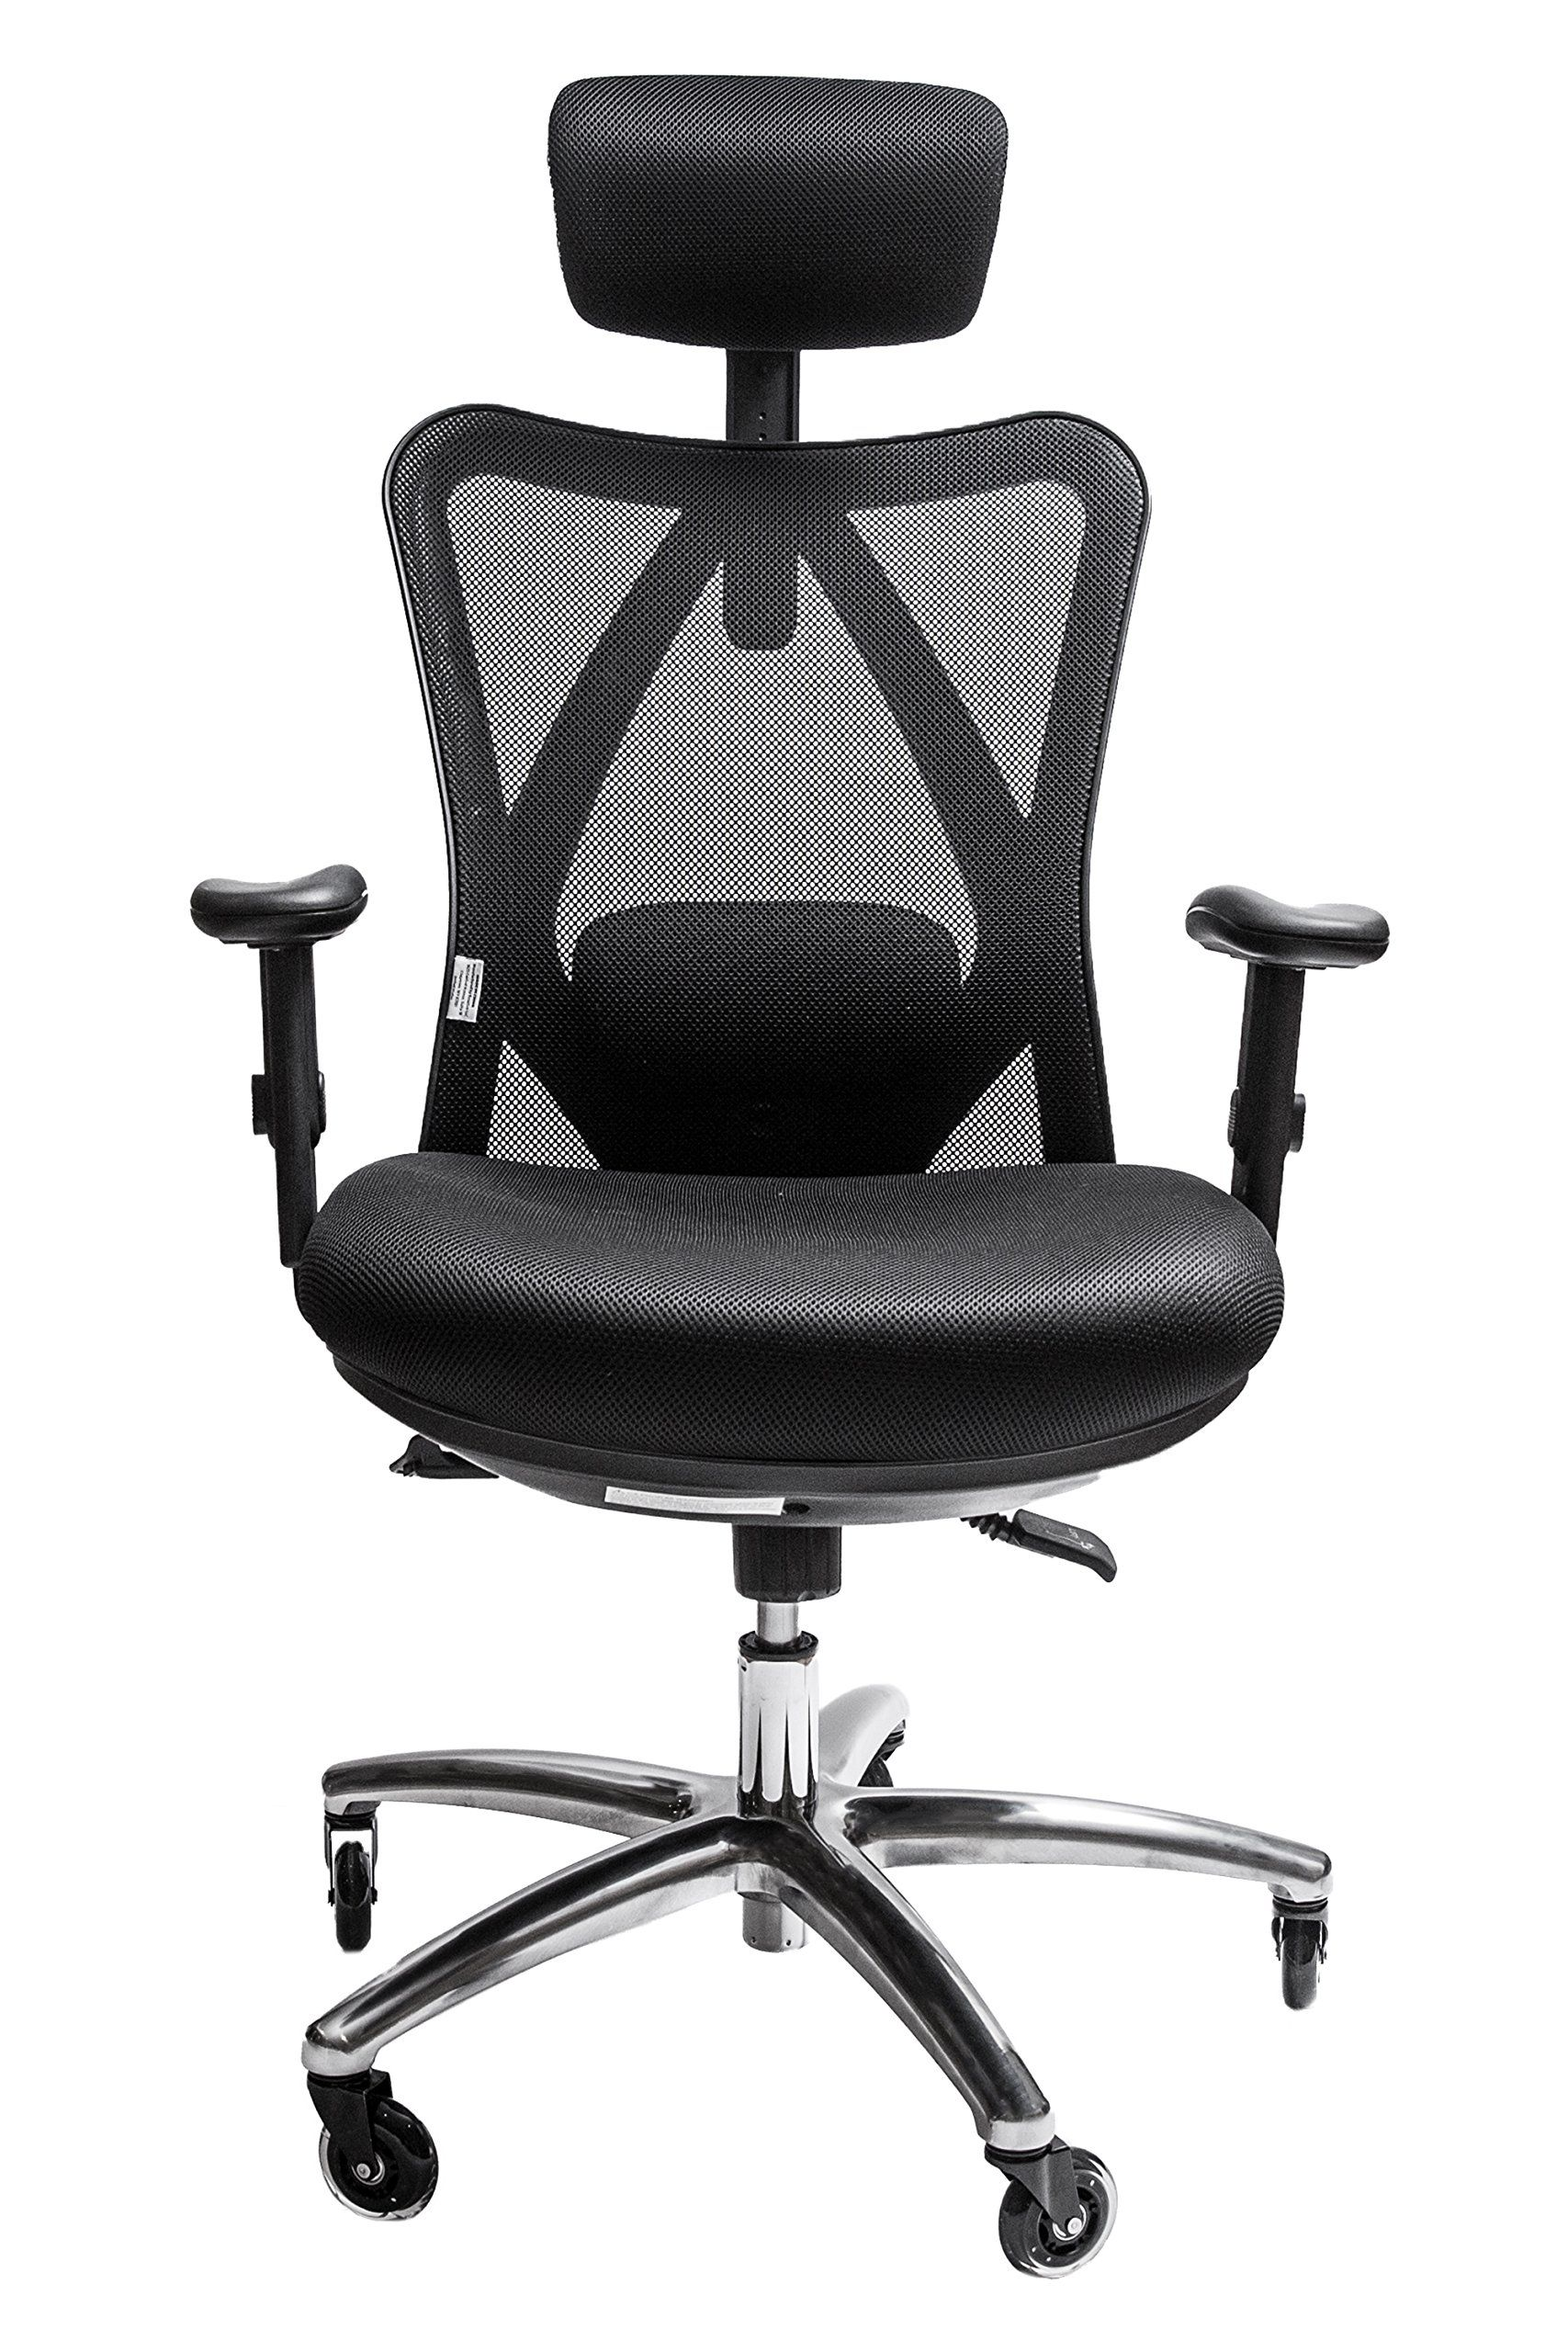 Sleekform Ergonomic Adjustable Office Chair Adjustable